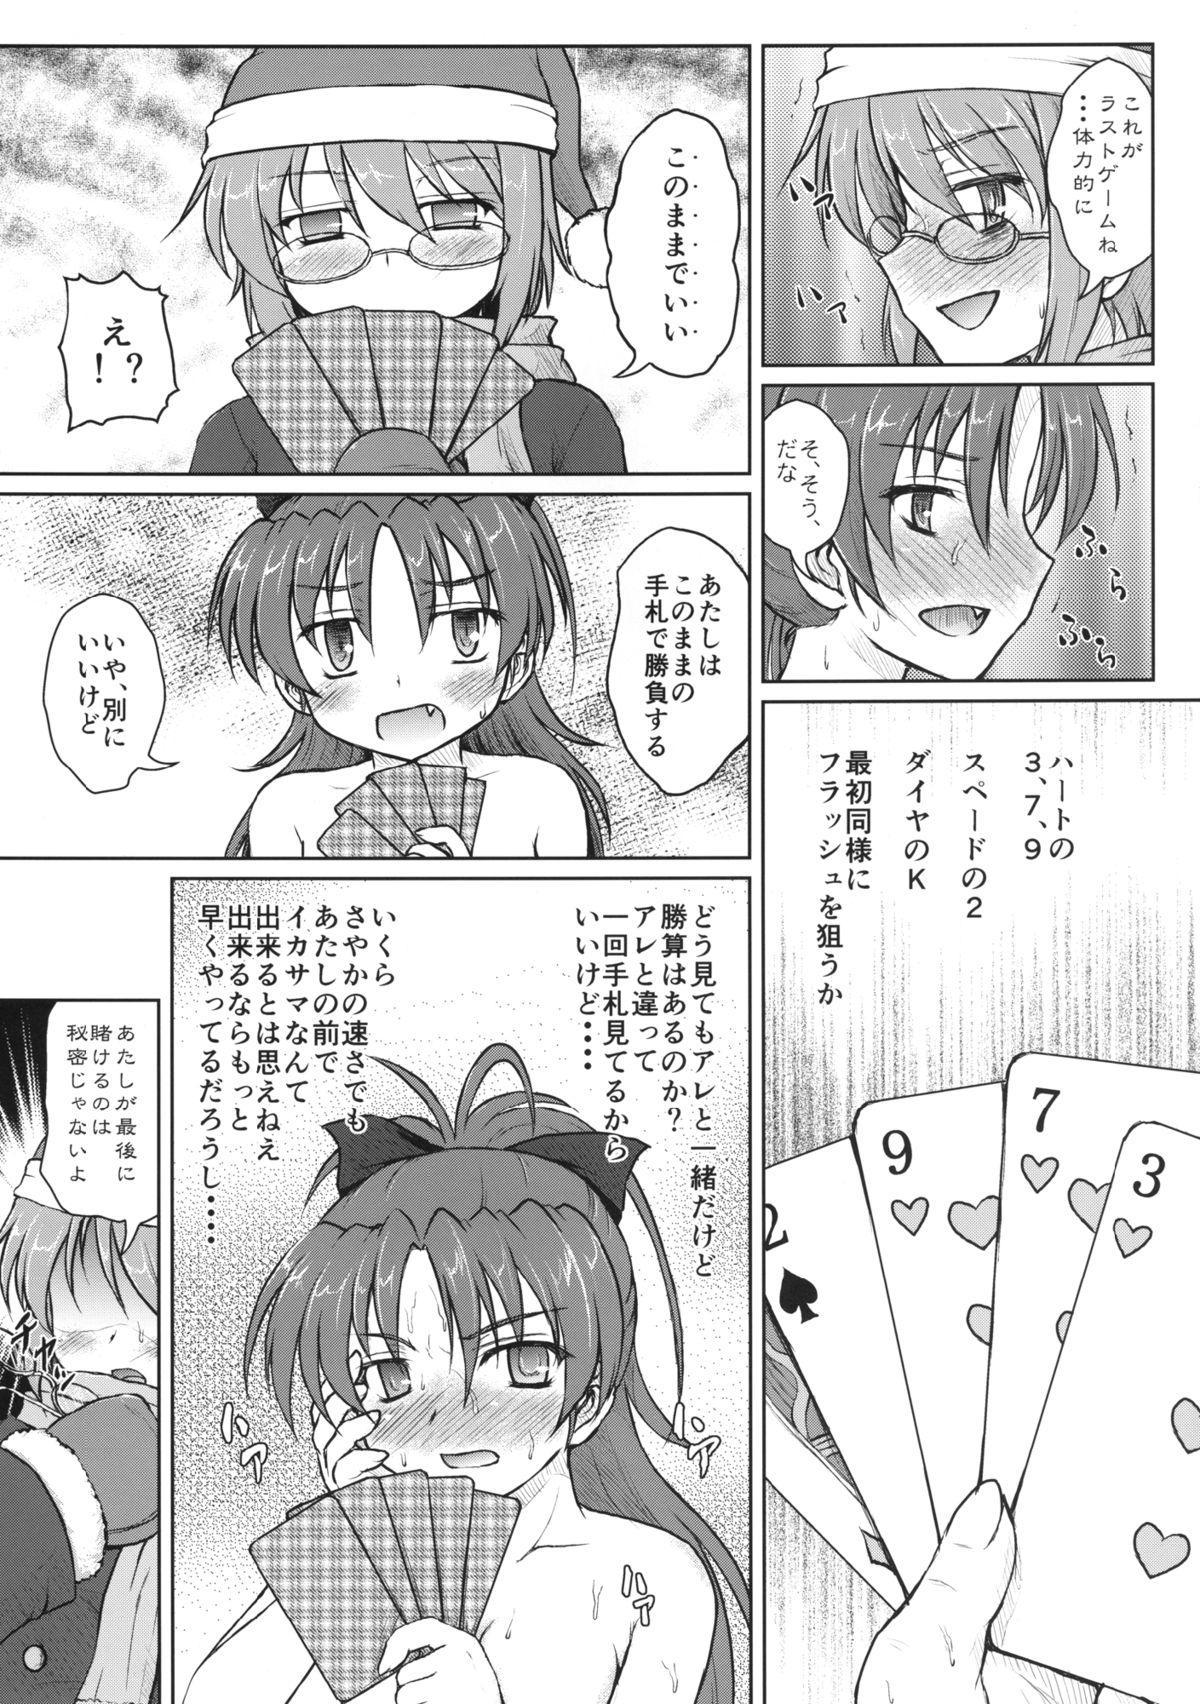 (SHT2013 Haru) [Newtype Kenkyuujo (Kotowari)] Sayaka-san to Kyouko-san (Puella Magi Madoka Magica) 24